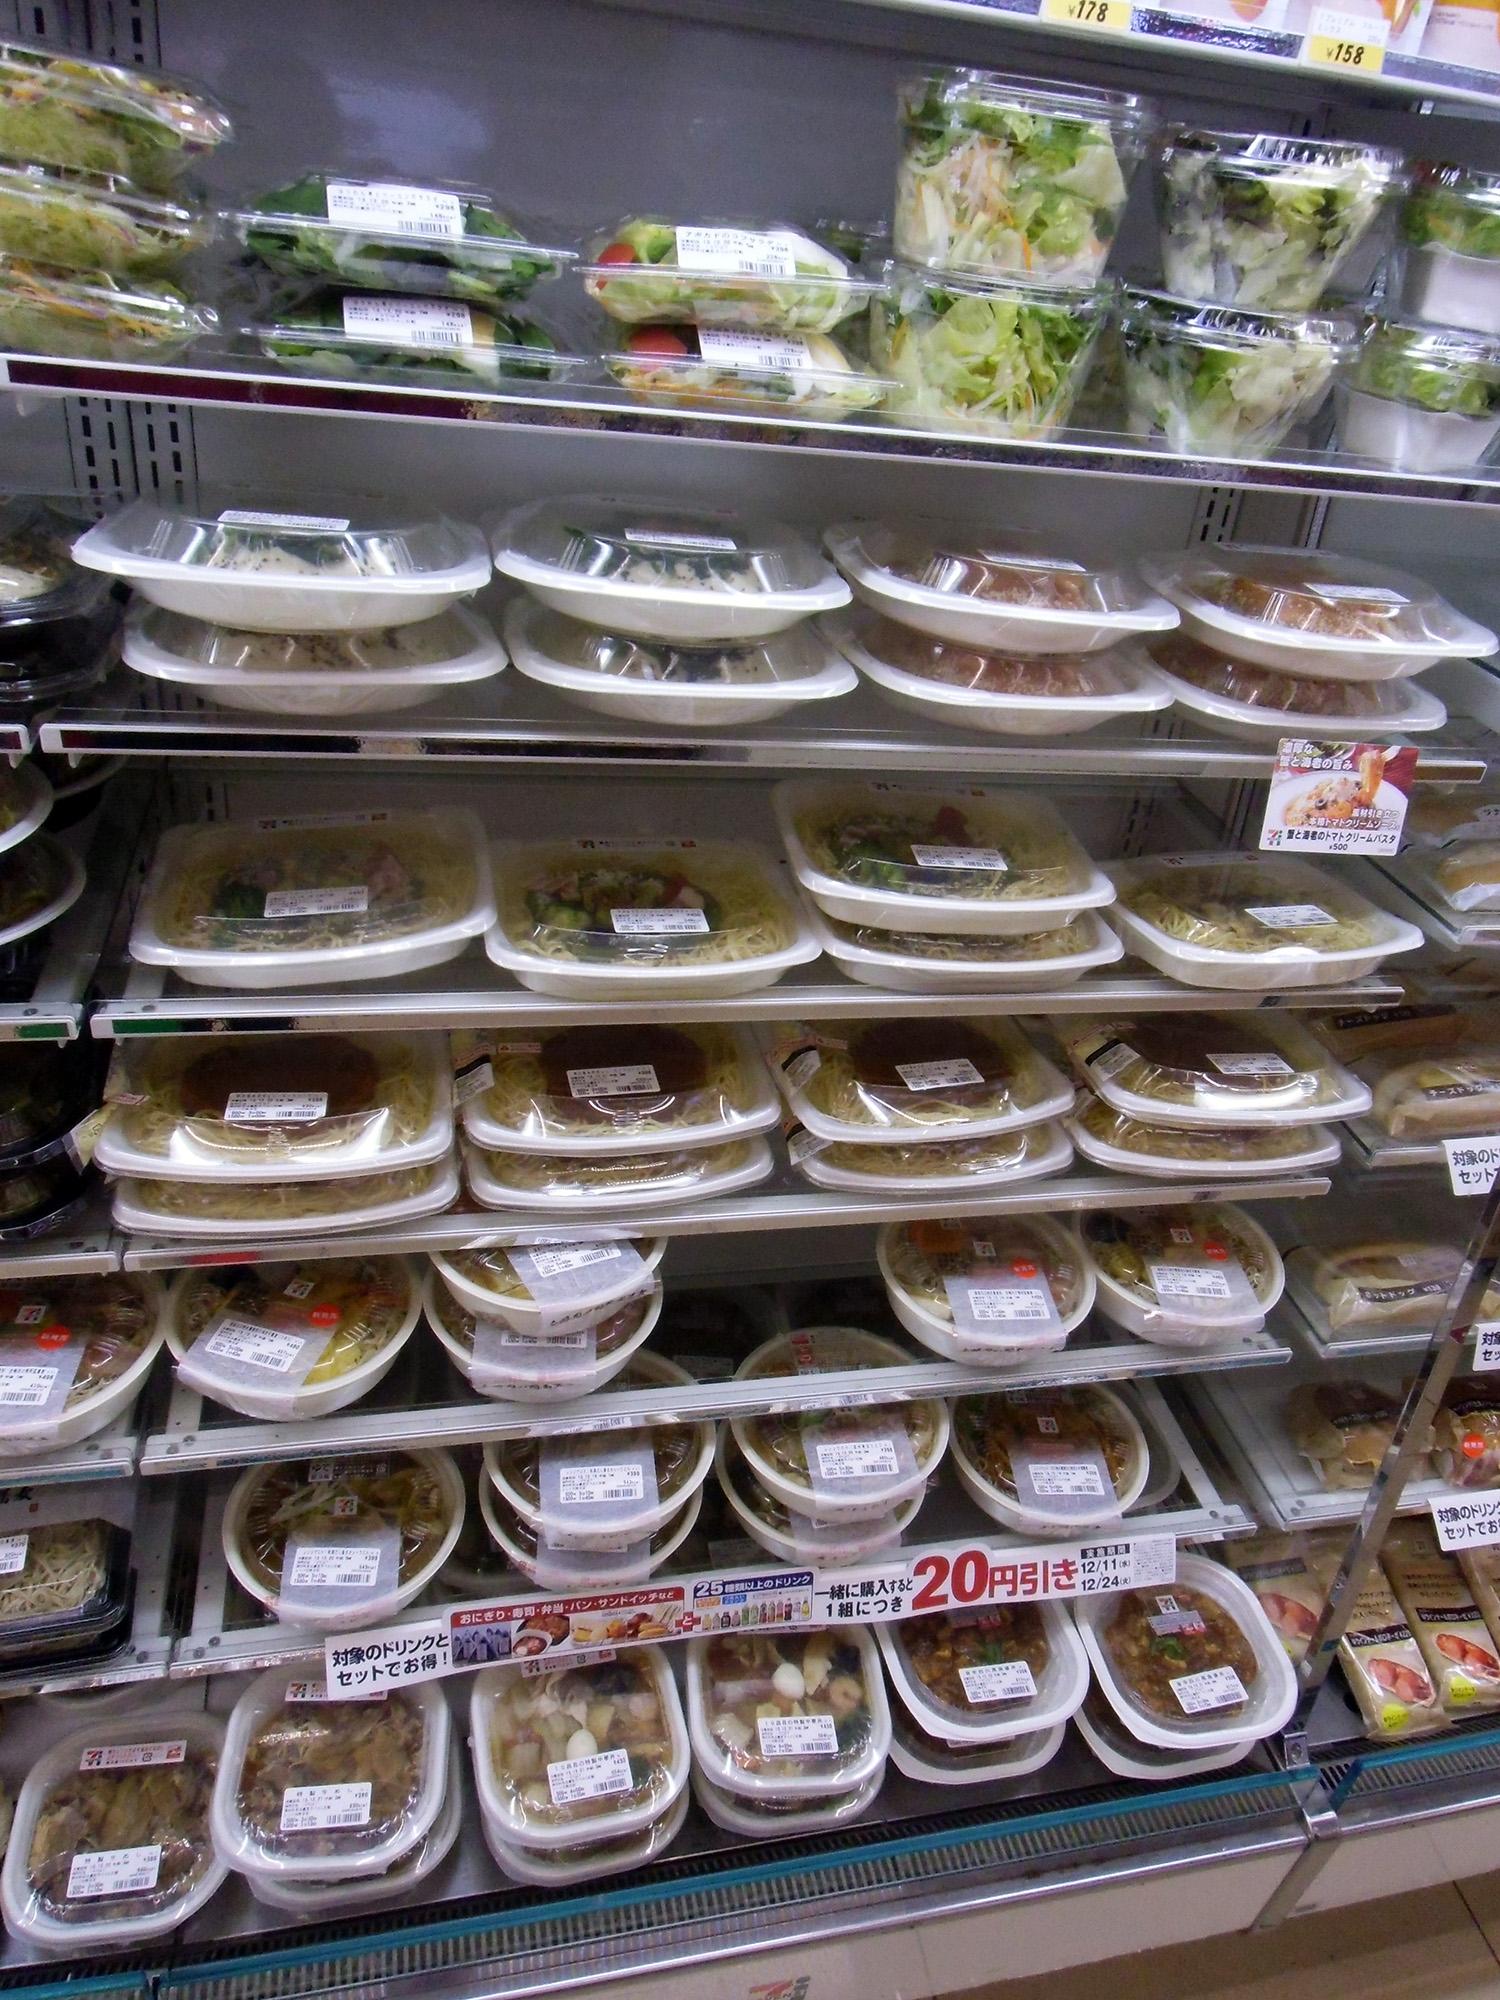 Japan Convenience Store Bento Boxes Review 7 11 Japanxhunter